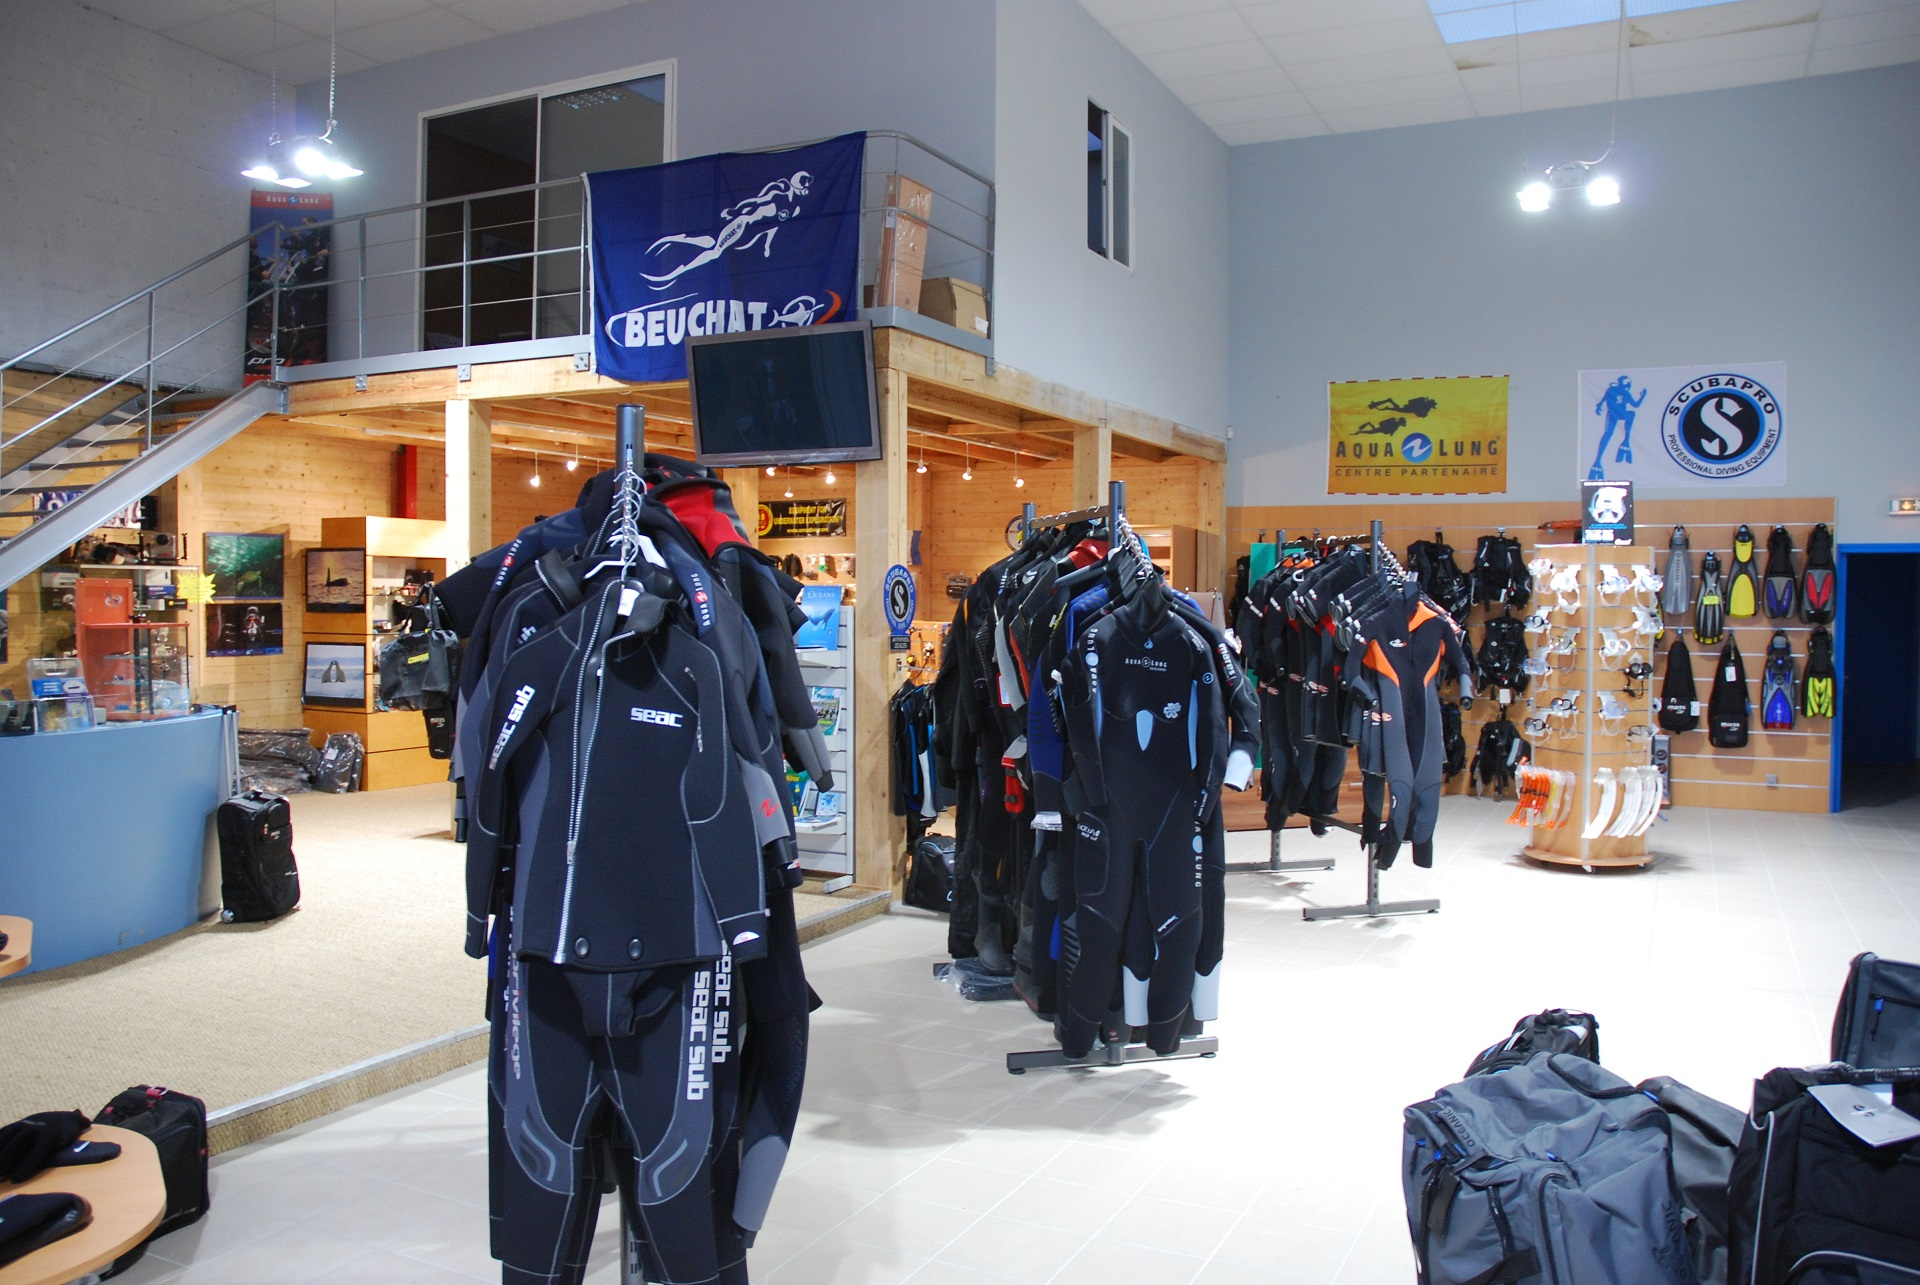 magasin sport lorient ; Commerce Morbihan; Bretagne sud